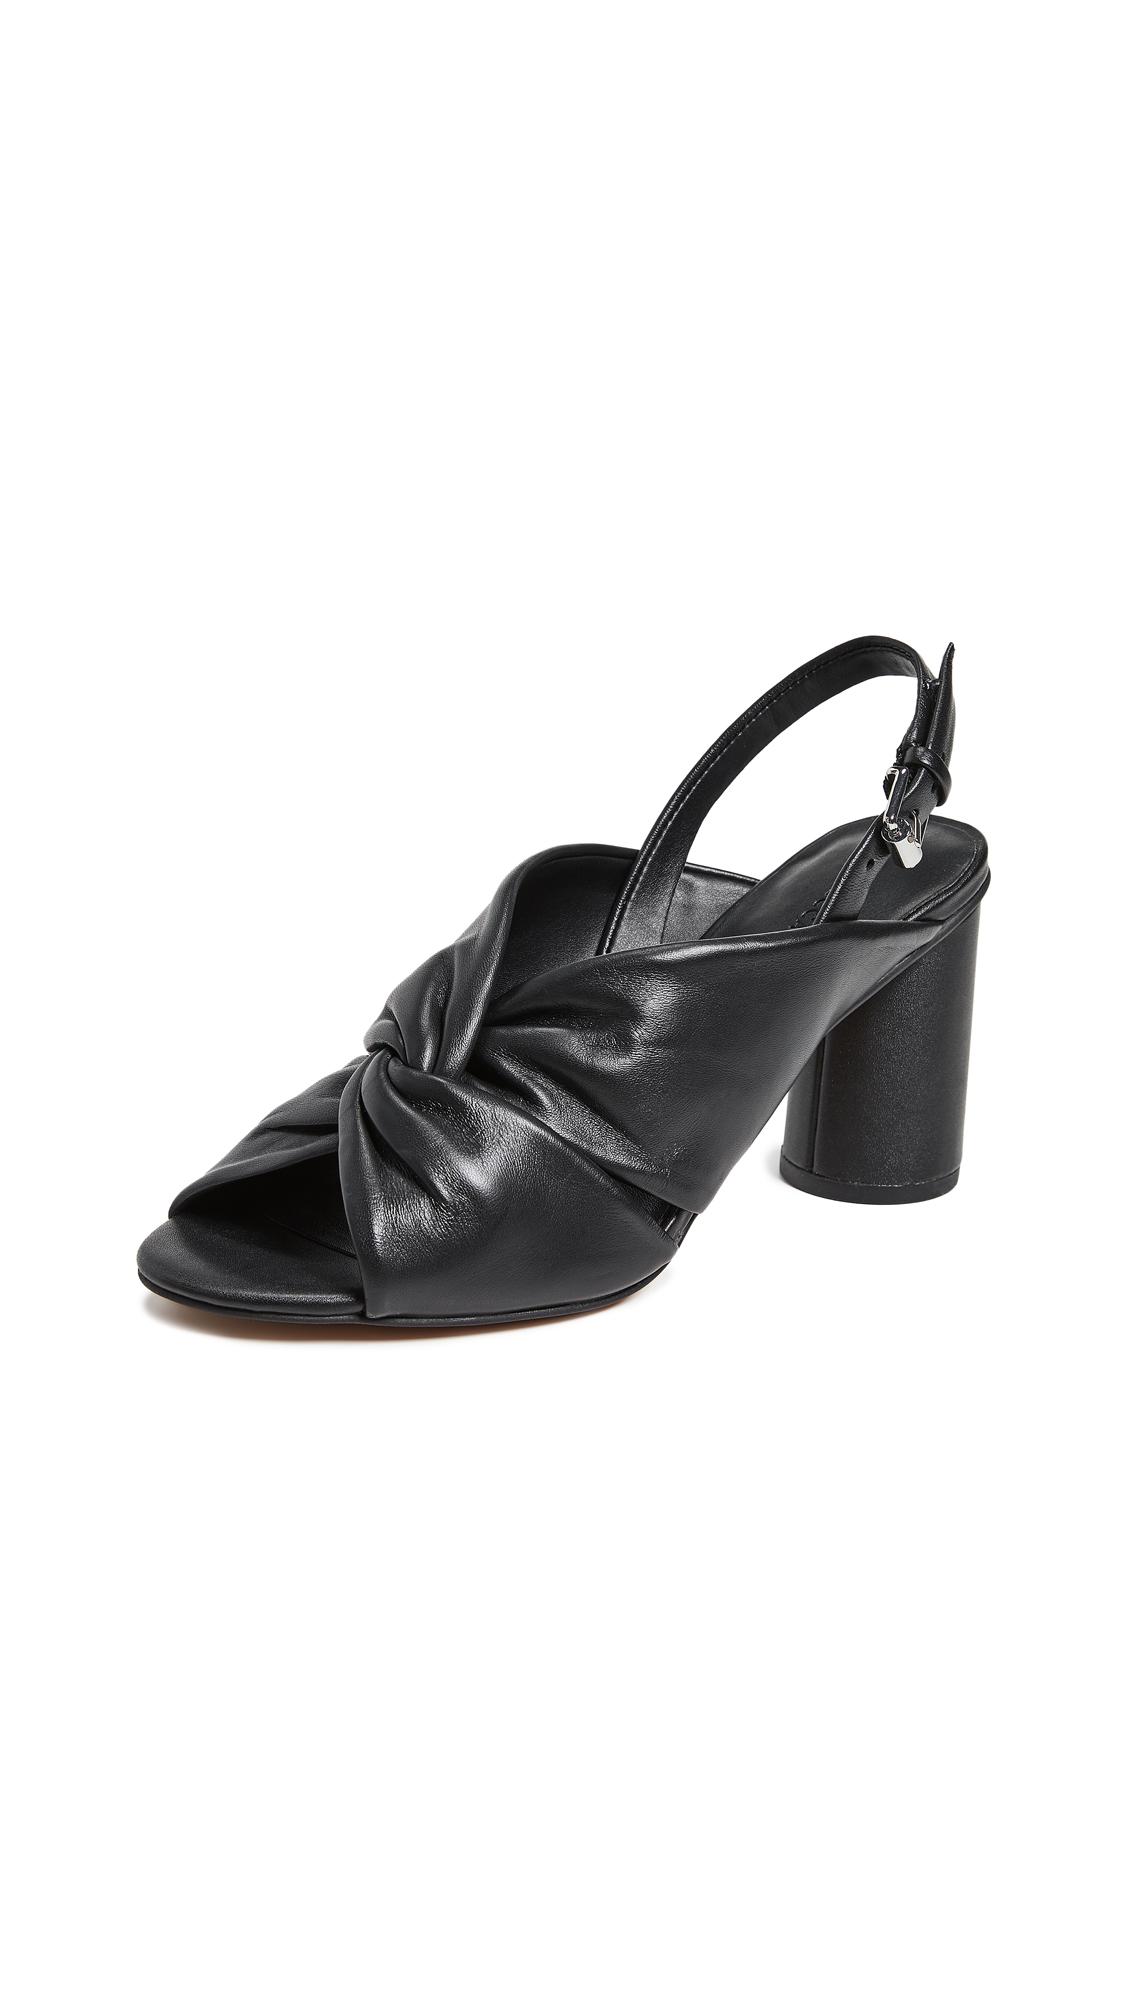 Rebecca Minkoff Agata Block Heel Slingbacks - Black